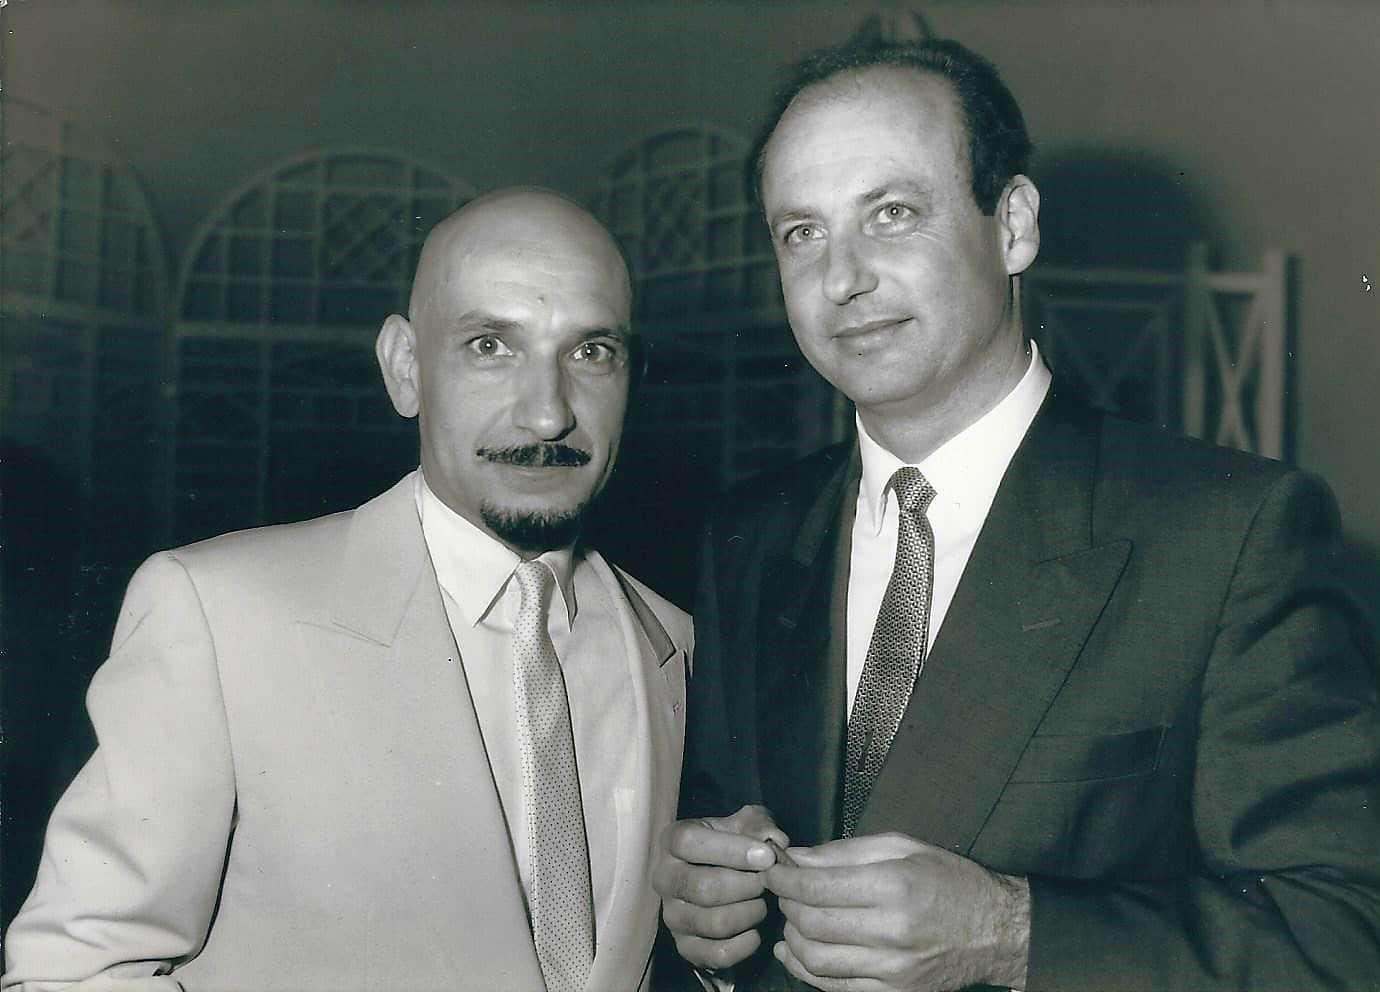 Siegbert Metelko und Ben Kingsley